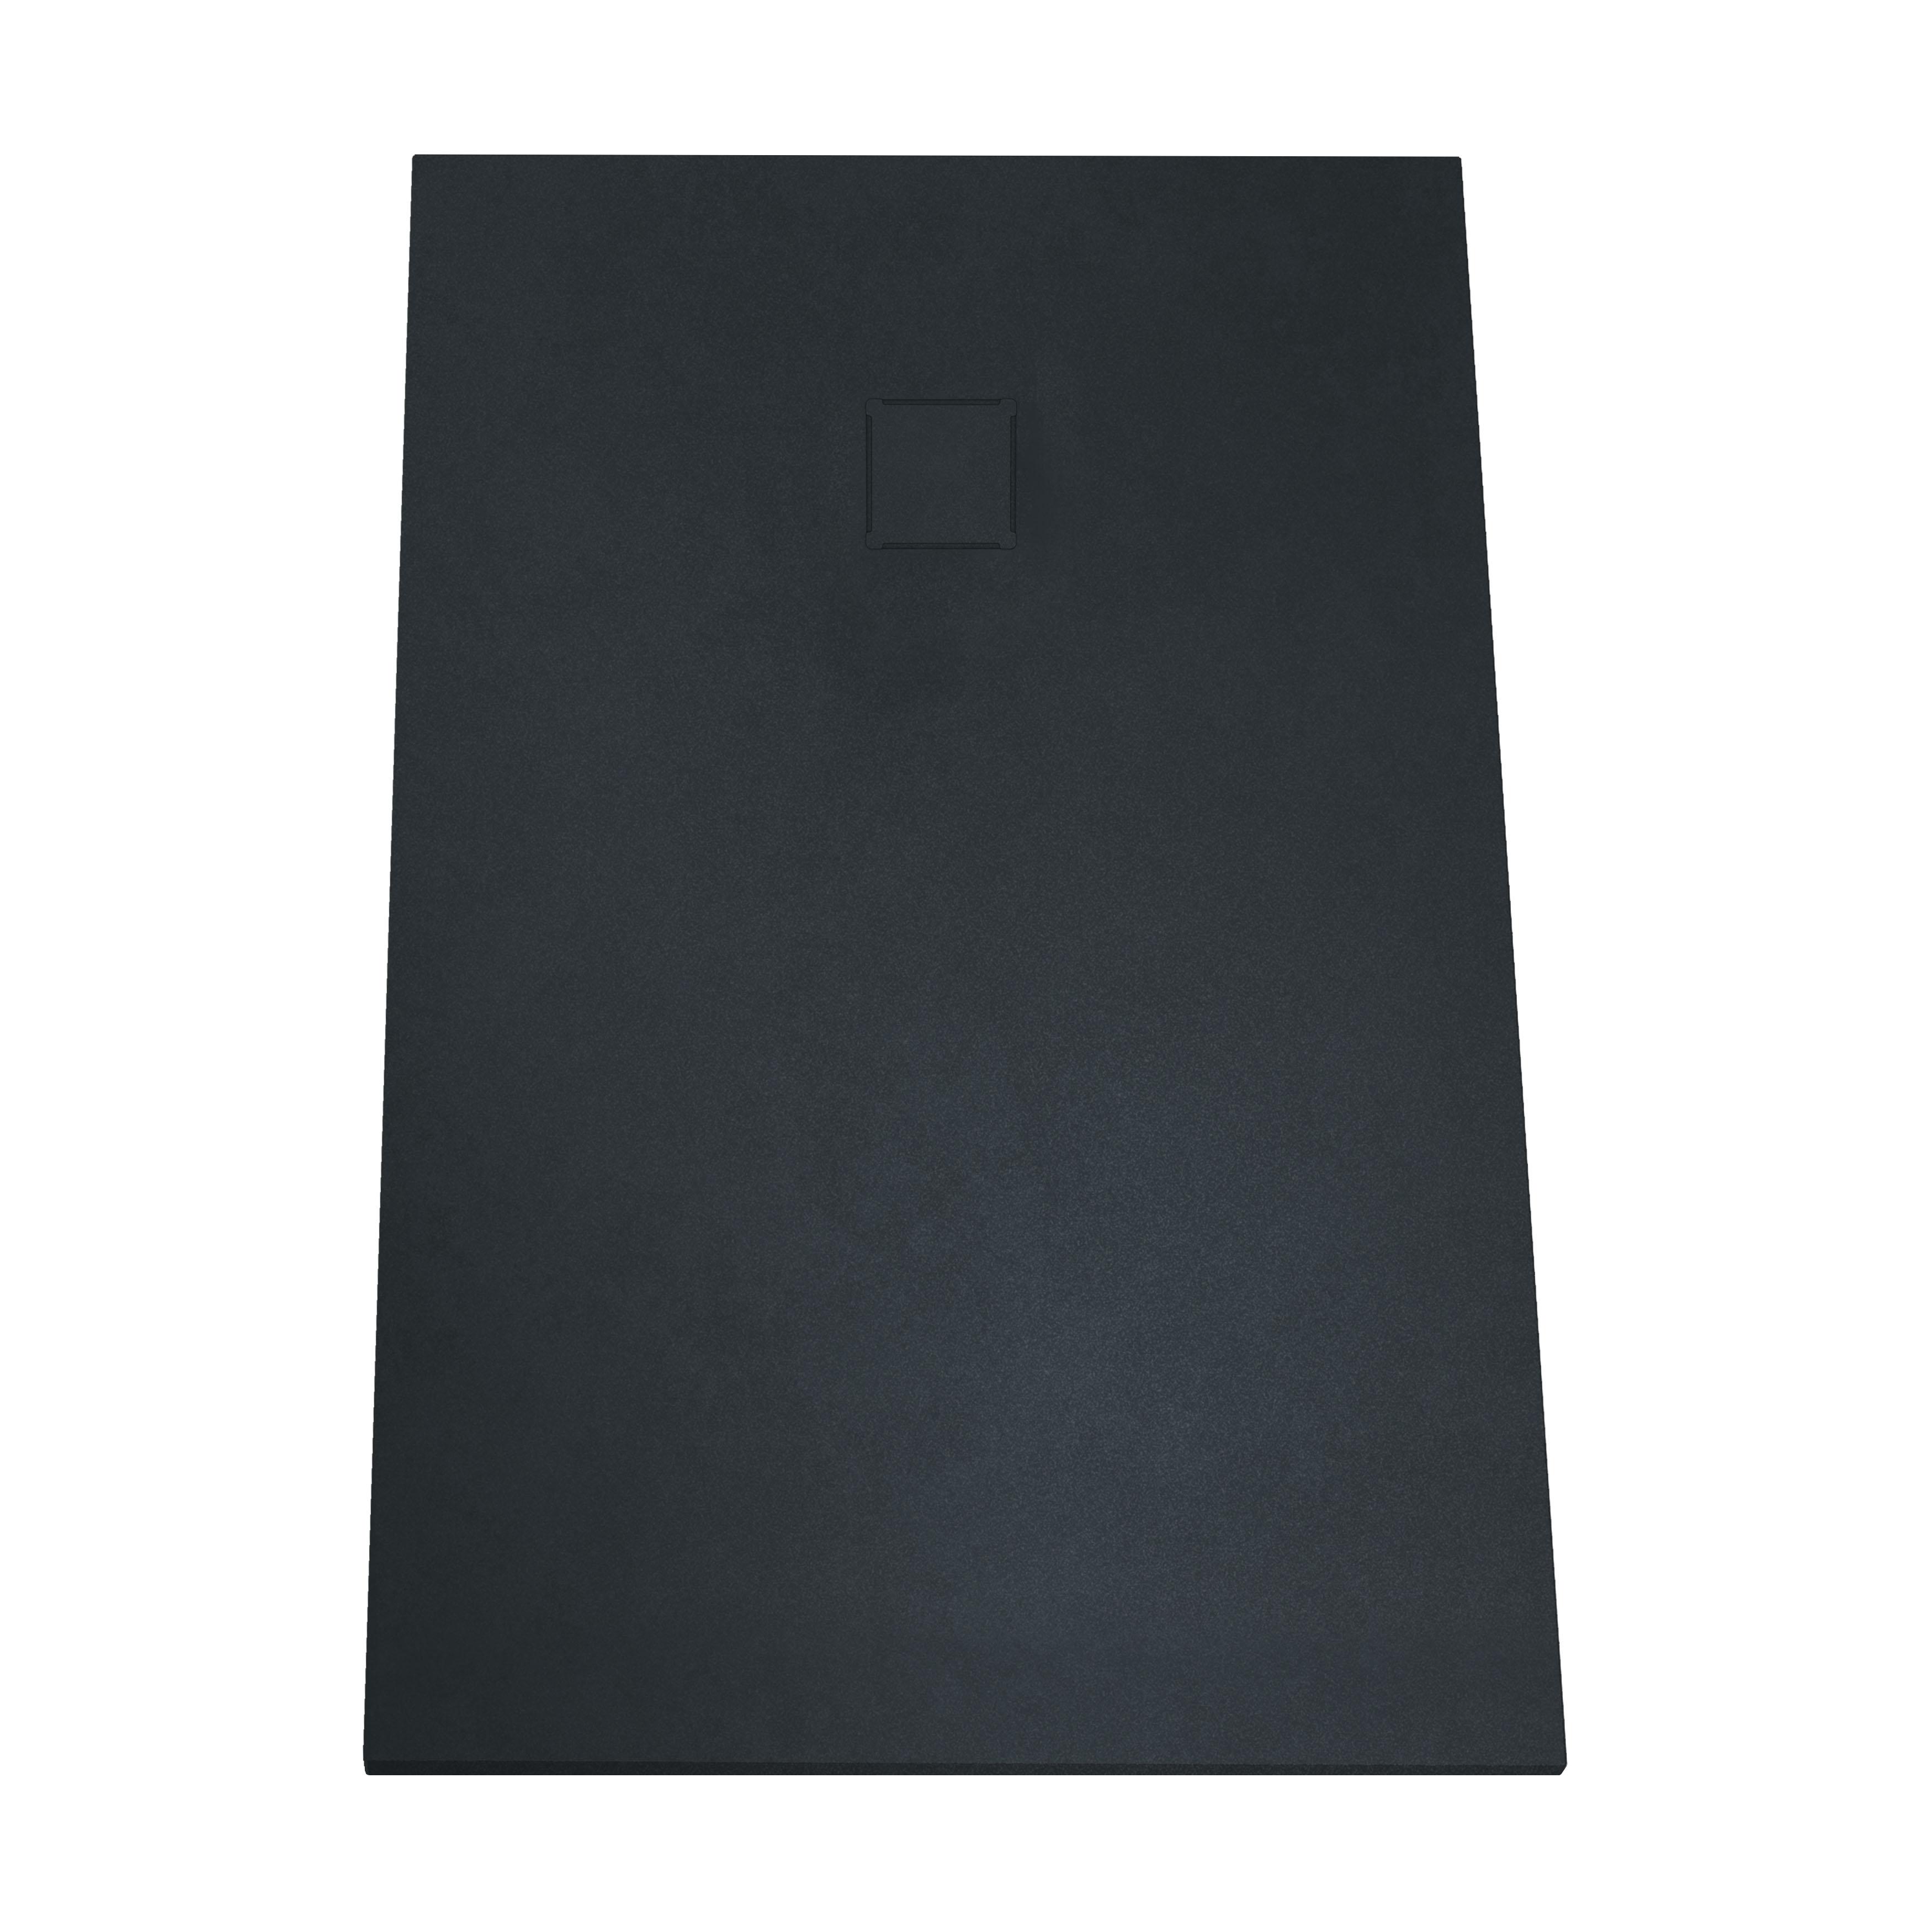 V-stone, receveur ultra plat en solid stone, 160  x  90 cm, anthraciteacite